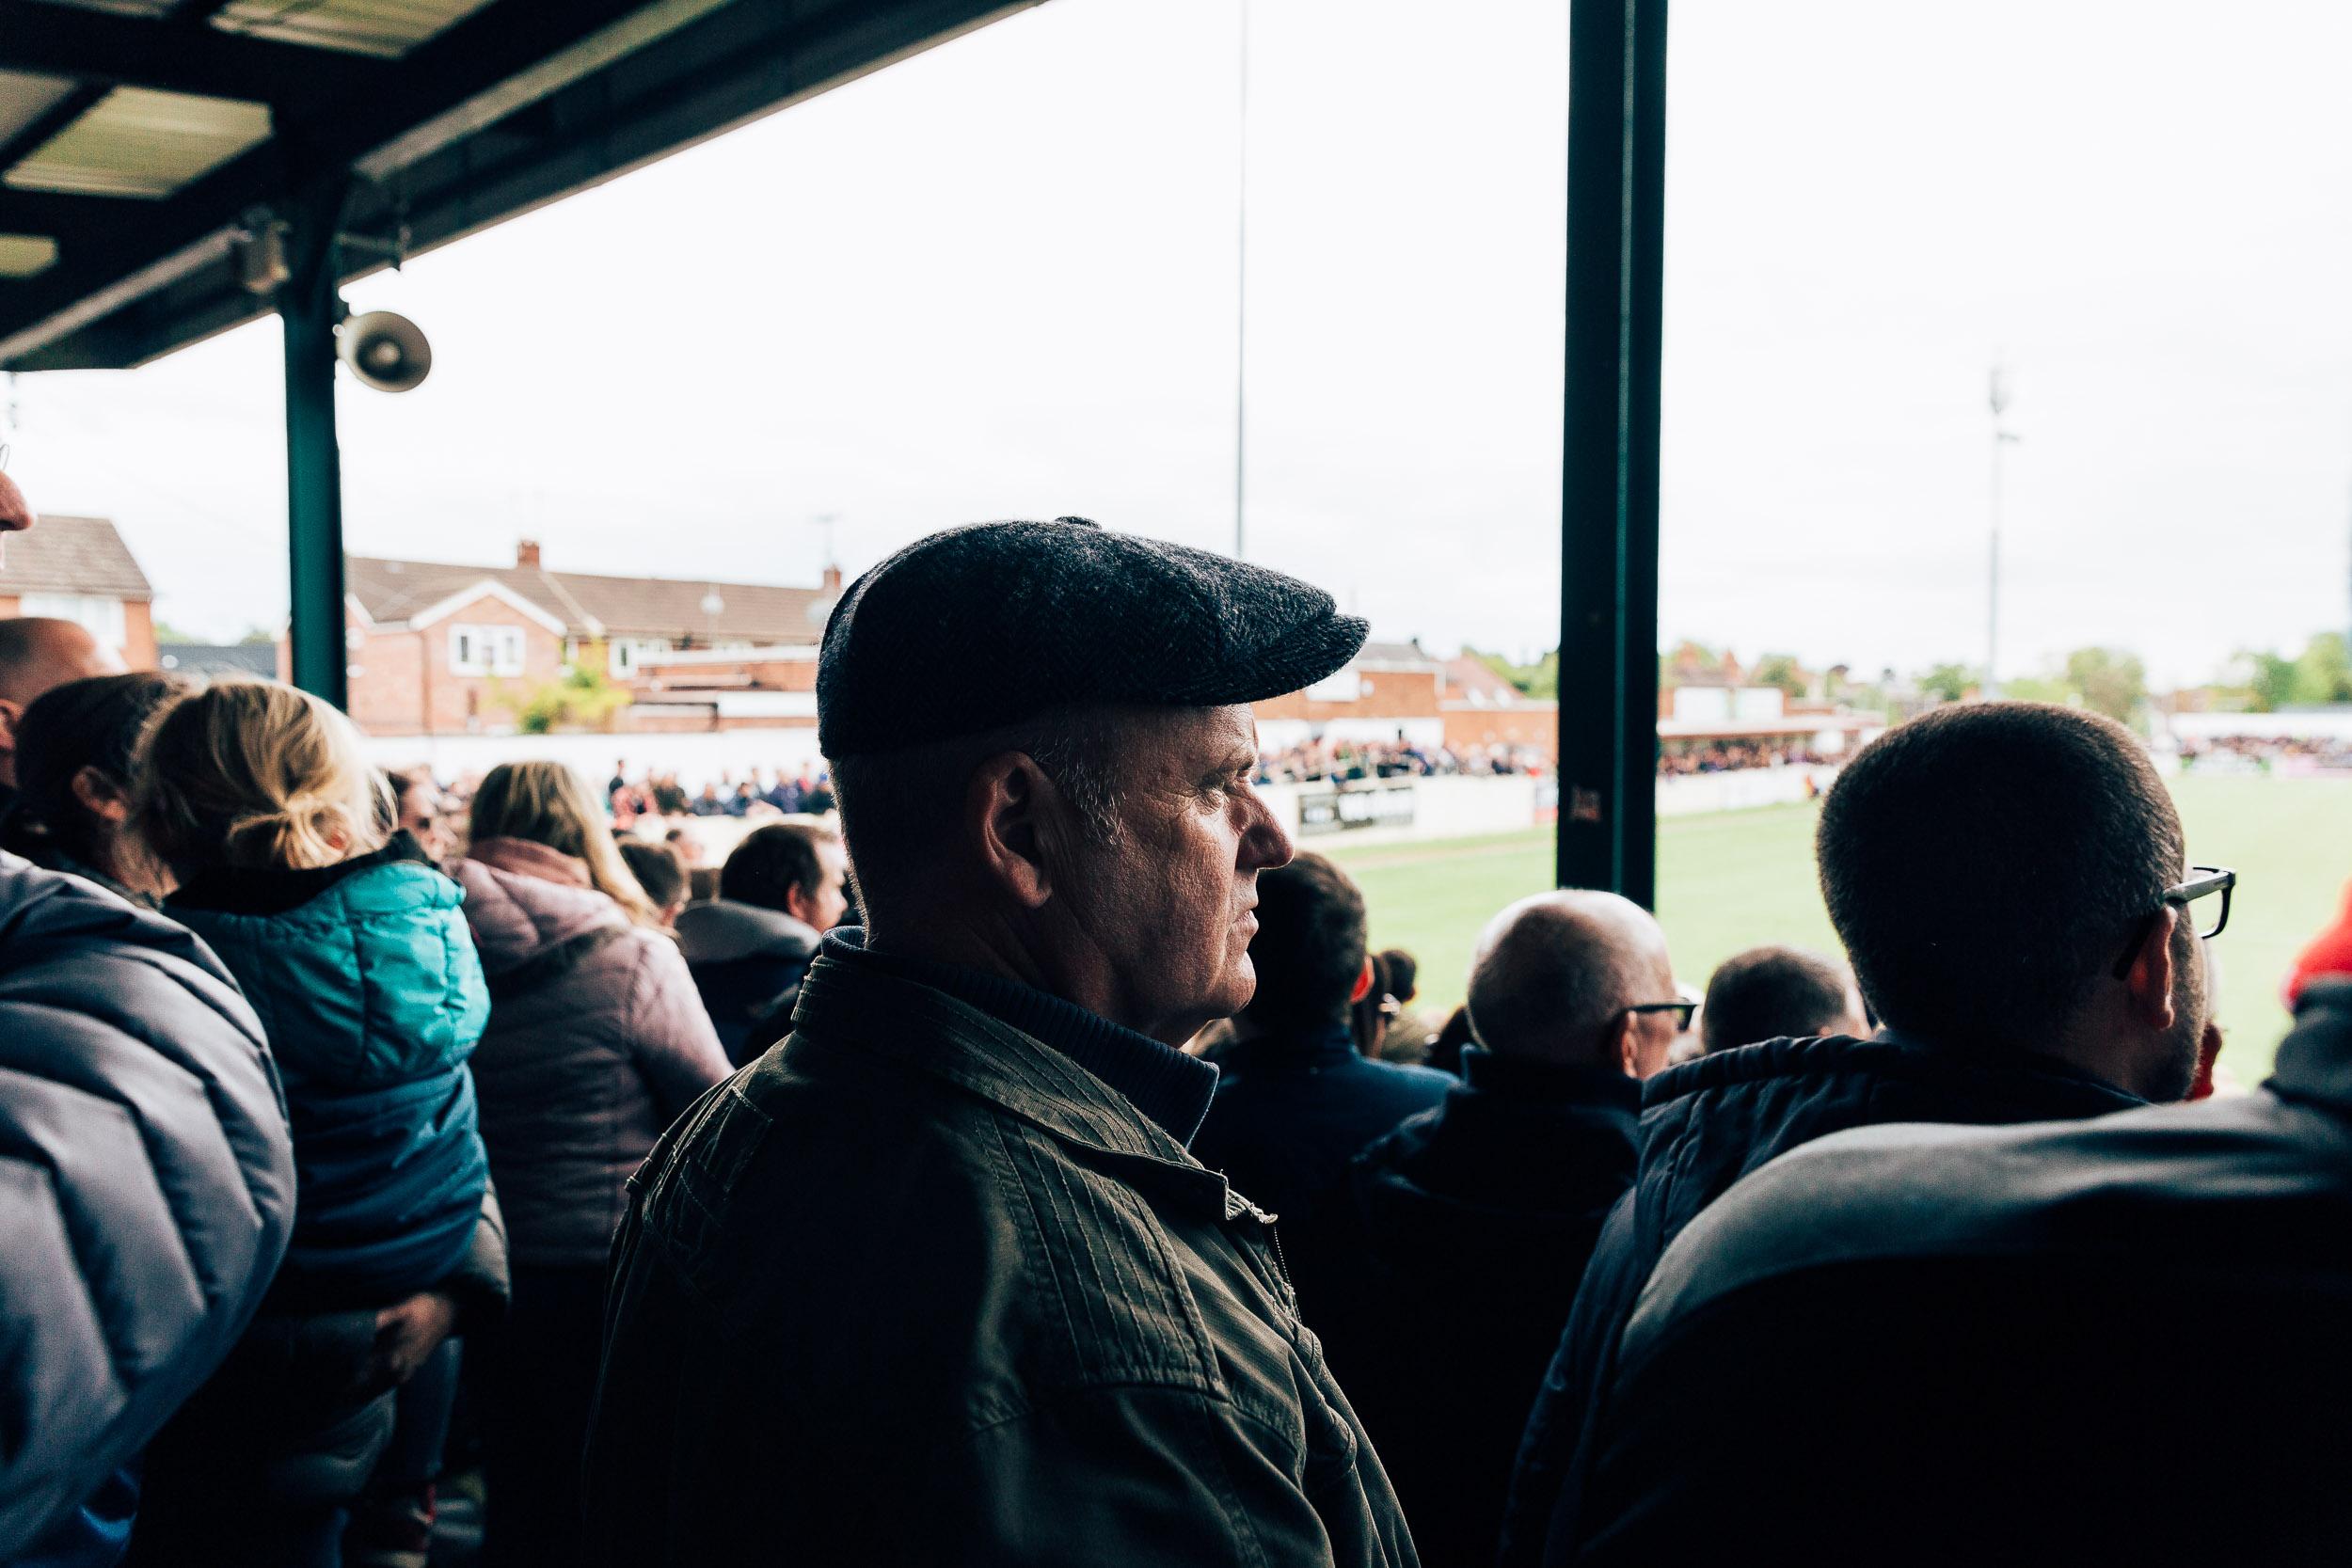 06_05_2019_Bromsgrove_Sporting_Corby-53.jpg